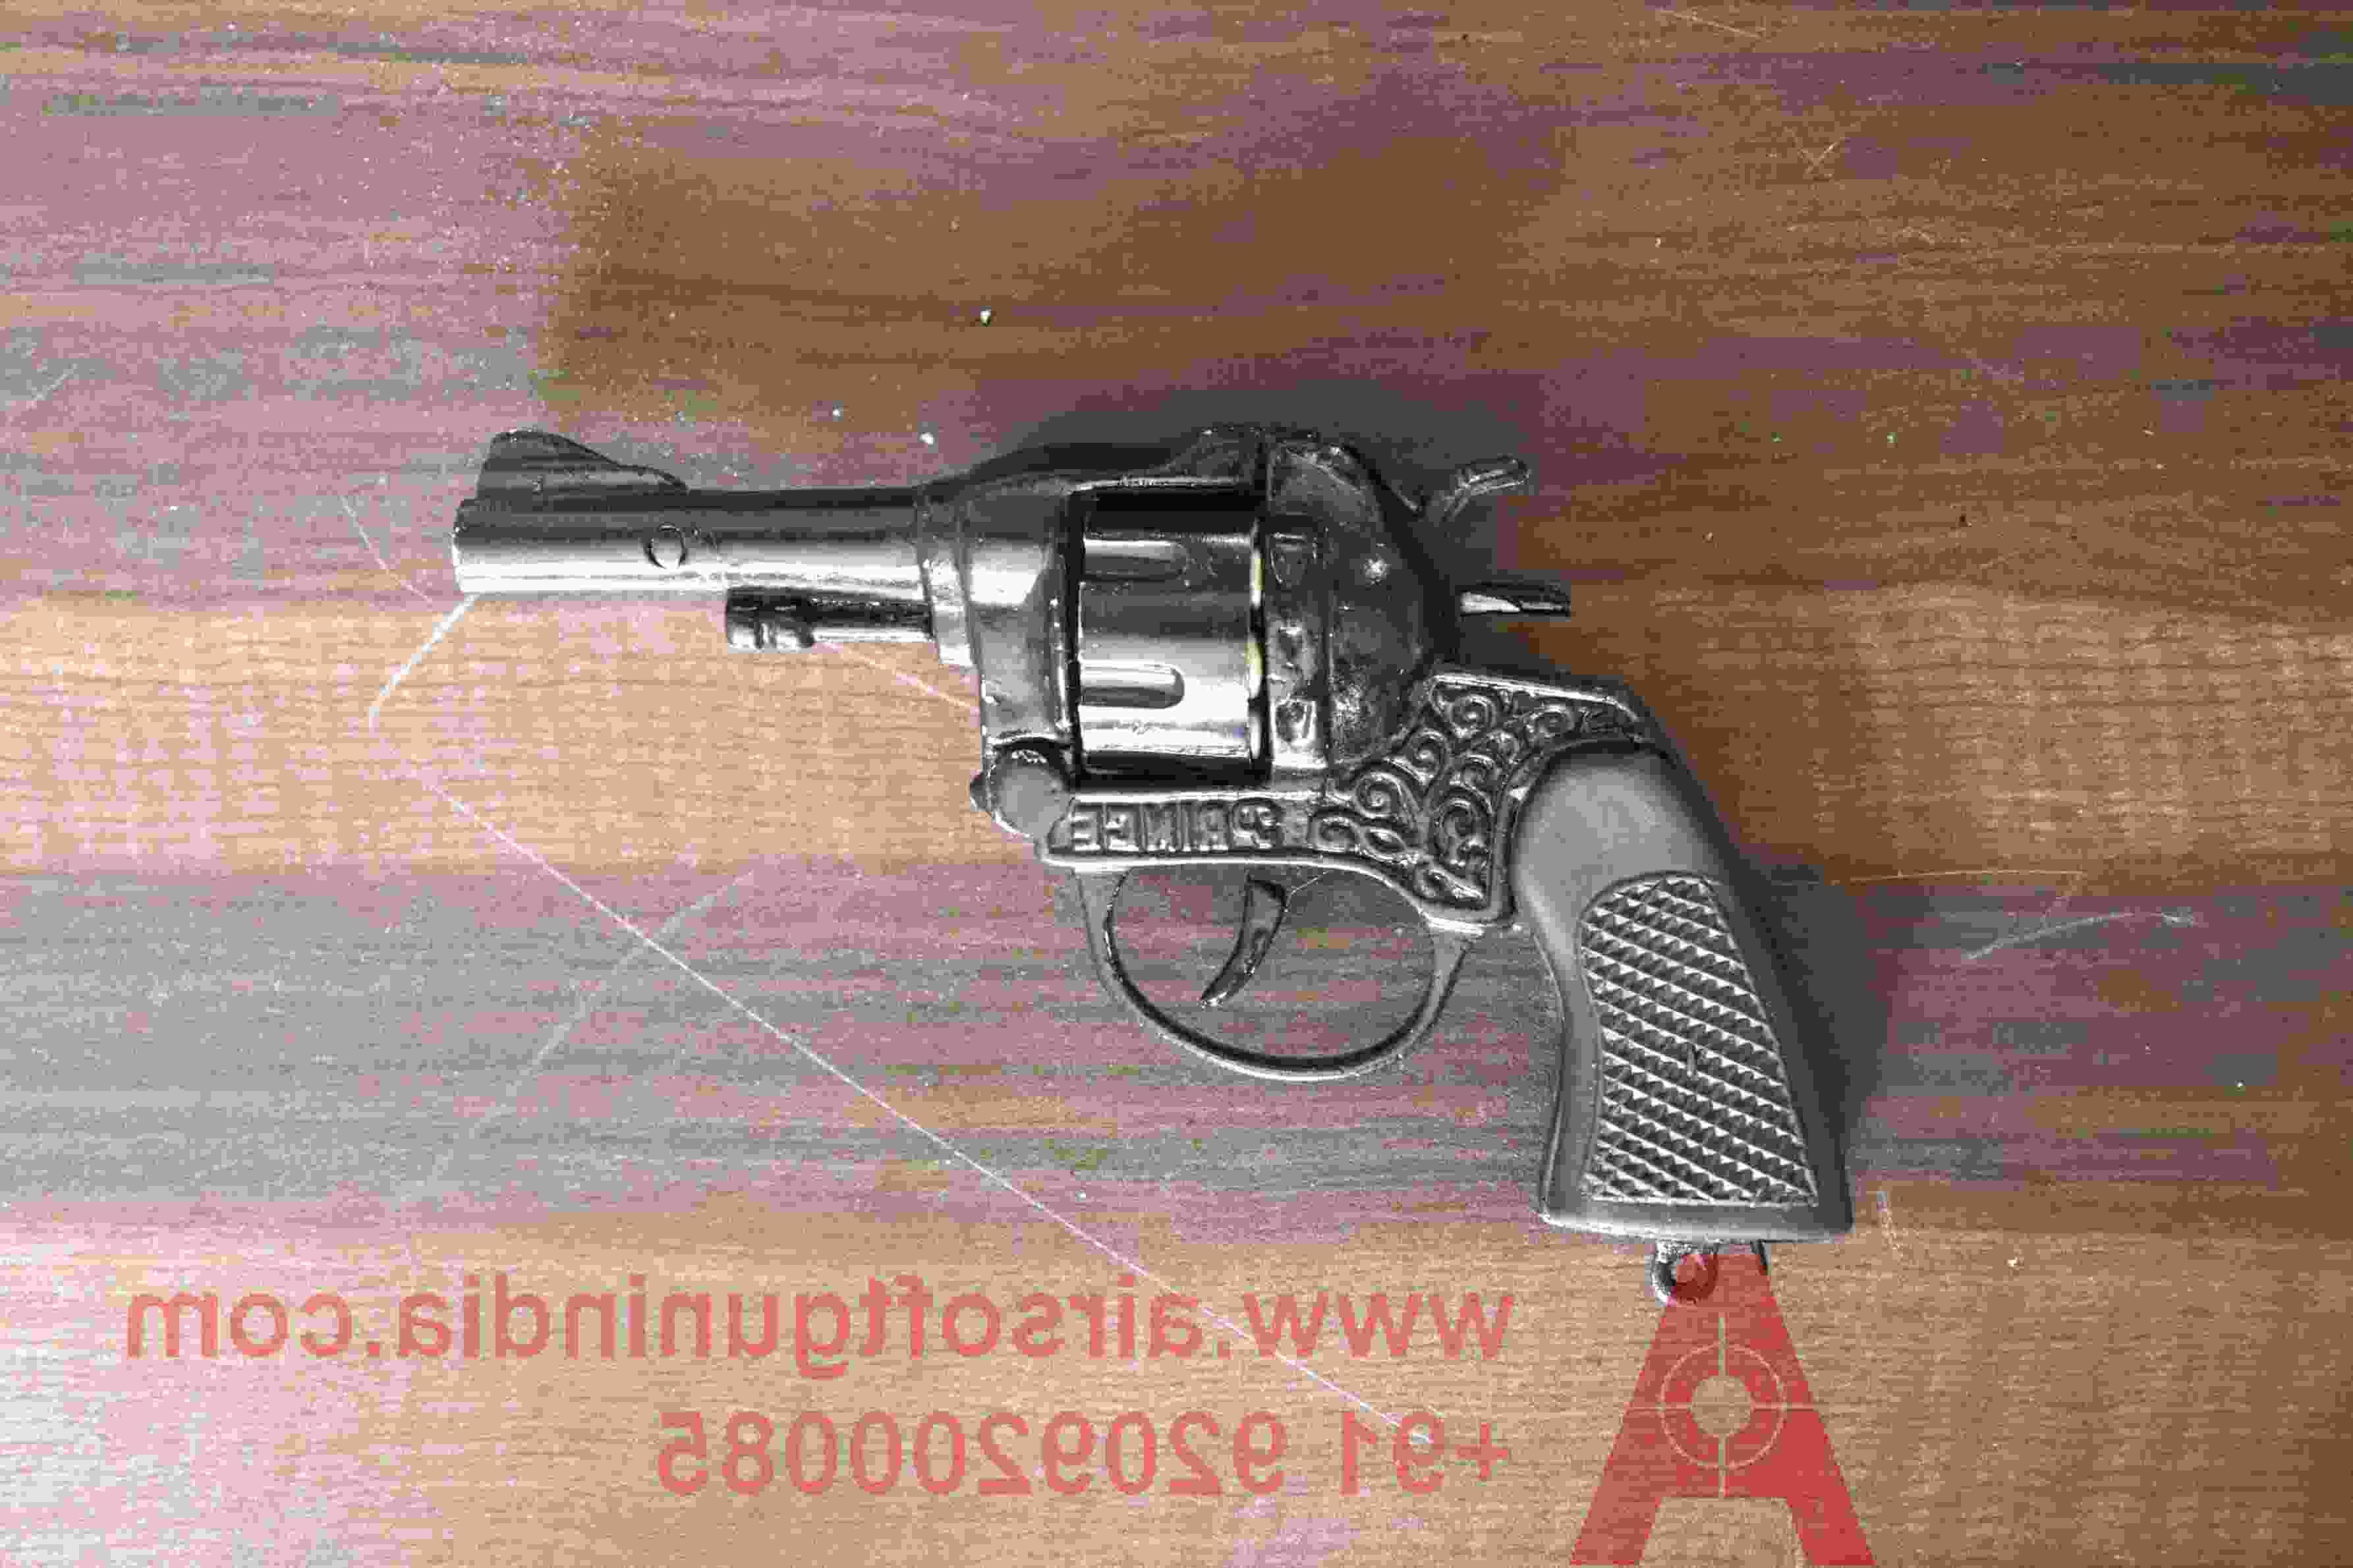 metal toy gun for sale